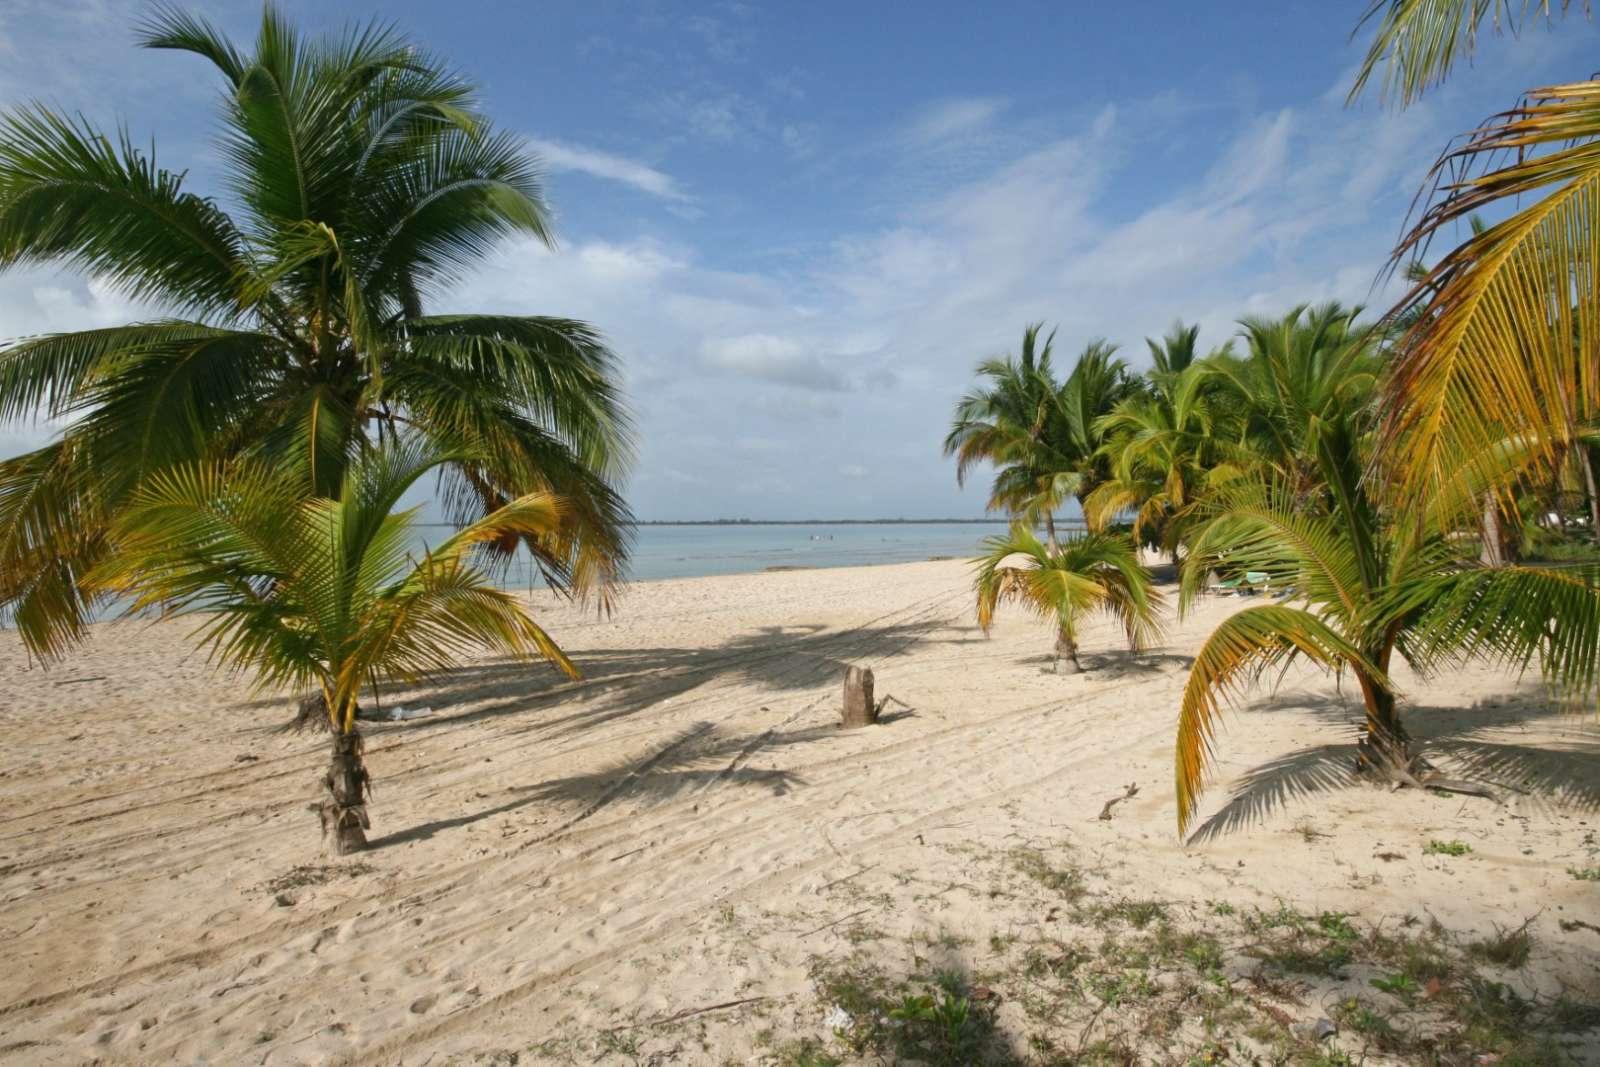 Deserted beach at Hotel Playa Larga